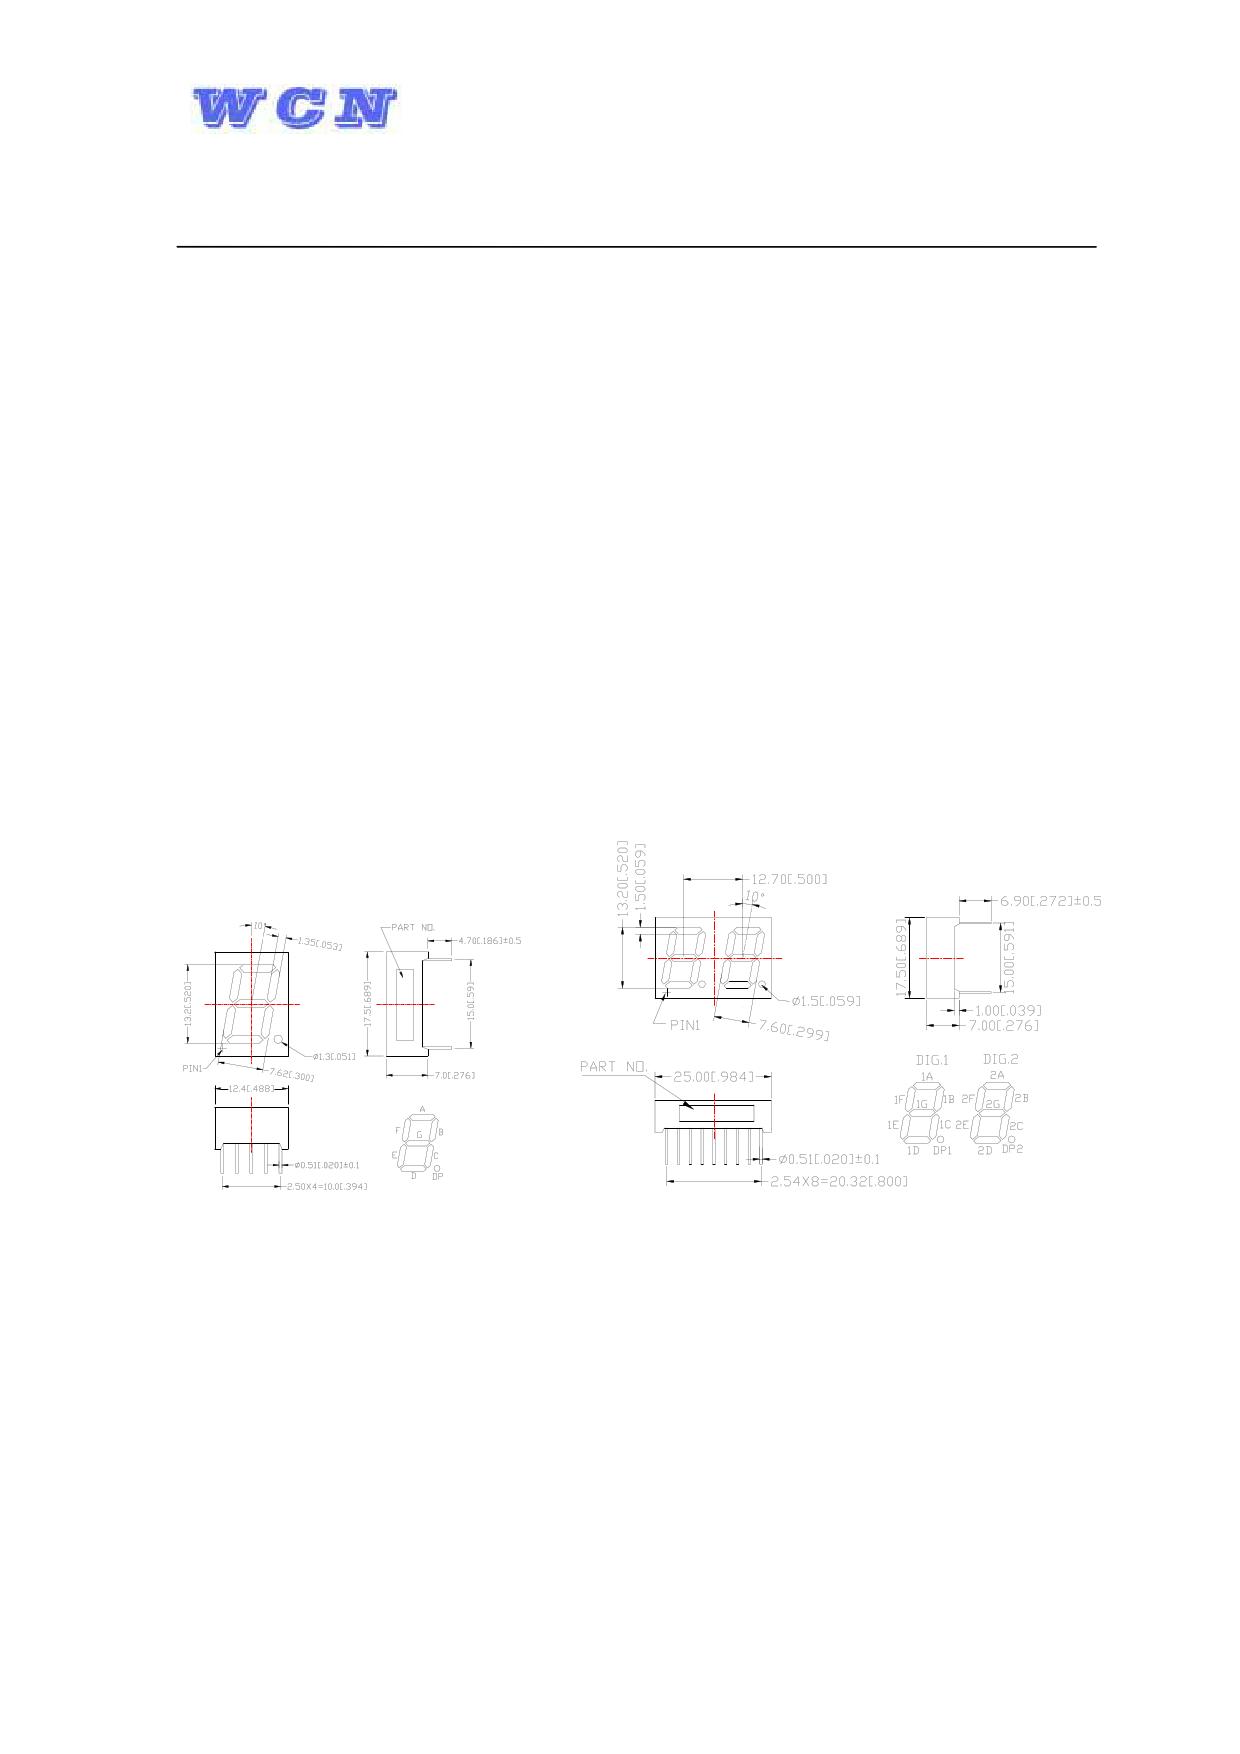 WCN2-0052SR-C11 datasheet